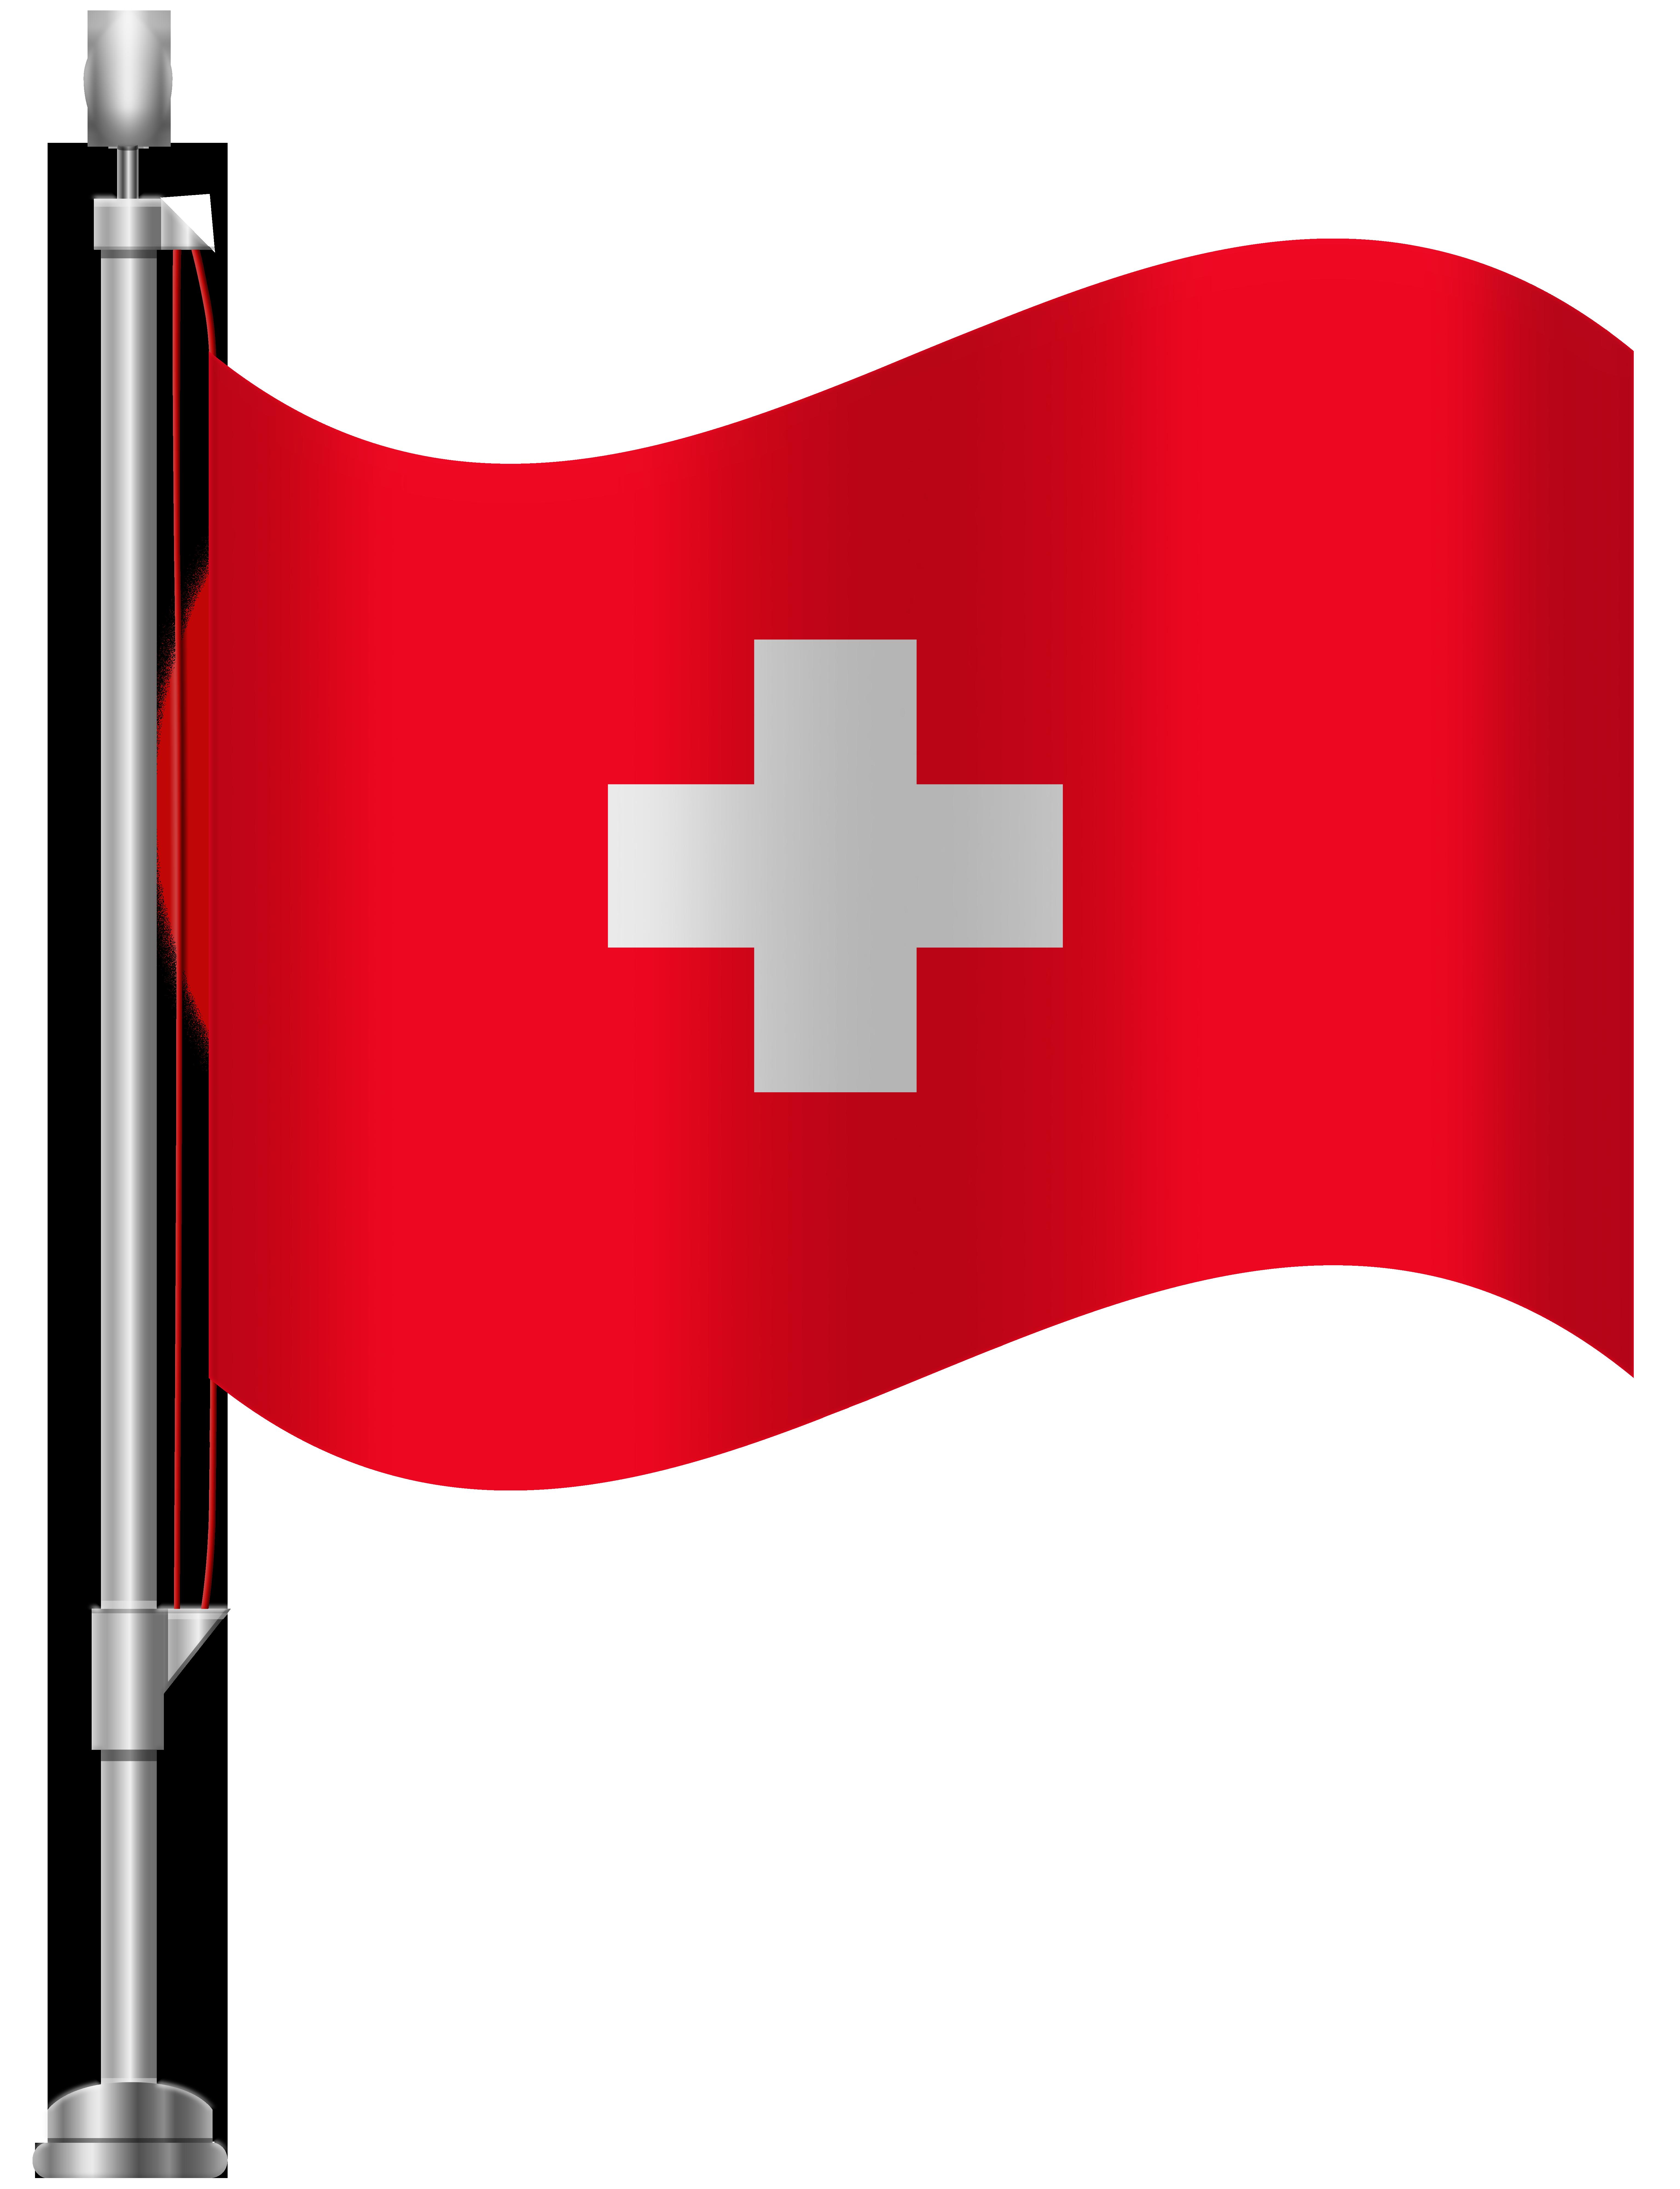 6141x8000 Switzerland Flag Png Clip Art